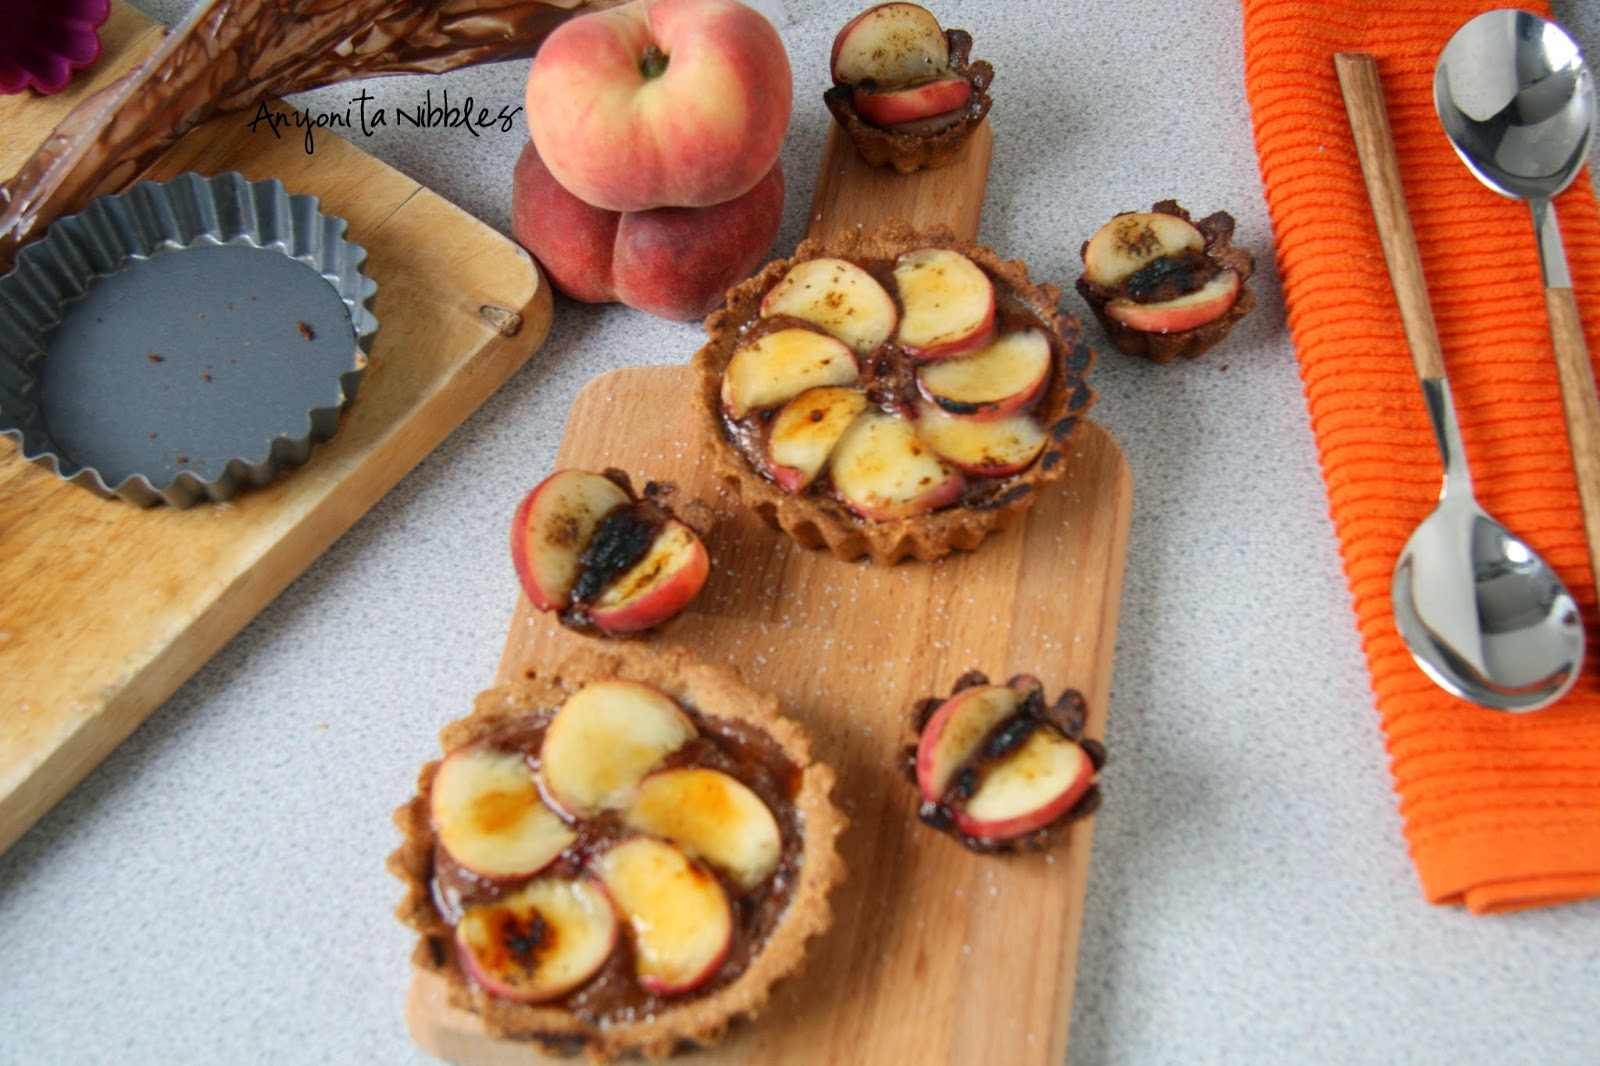 Brûléed Peach & Nutella Tarts & Materials by Anyonita Nibbles